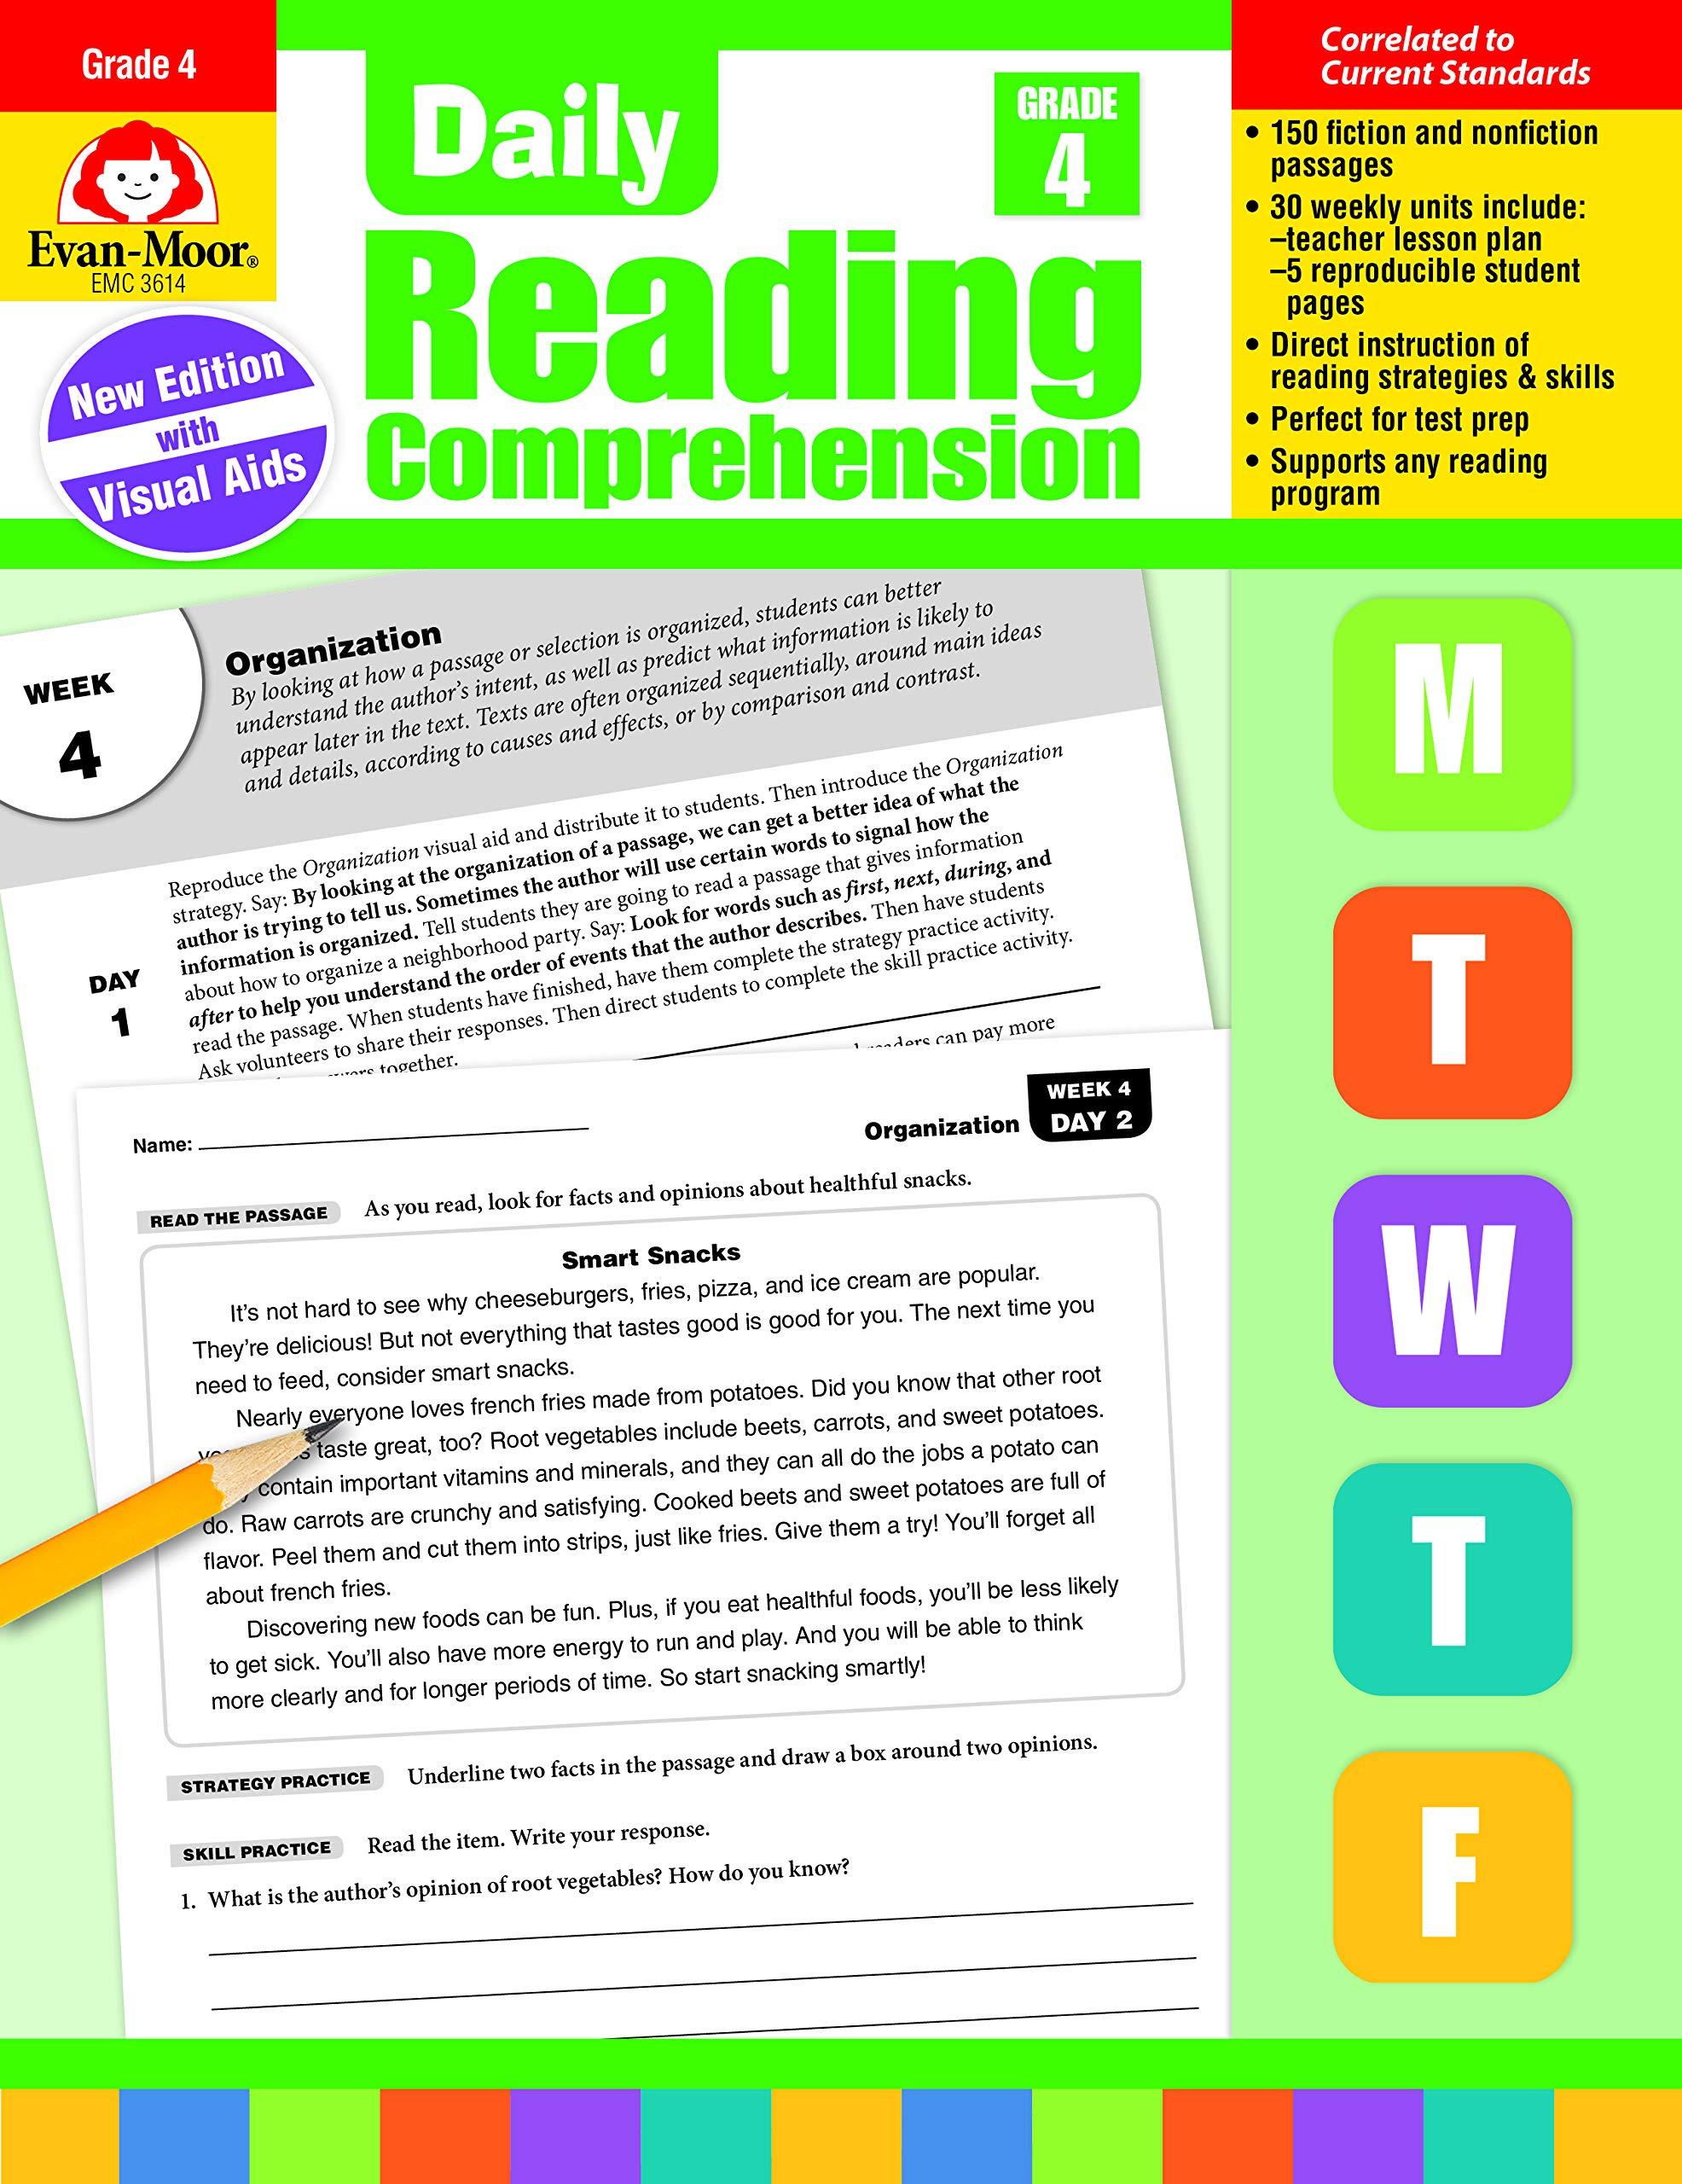 - Amazon.com: Daily Reading Comprehension, Grade 4 (9781629384771